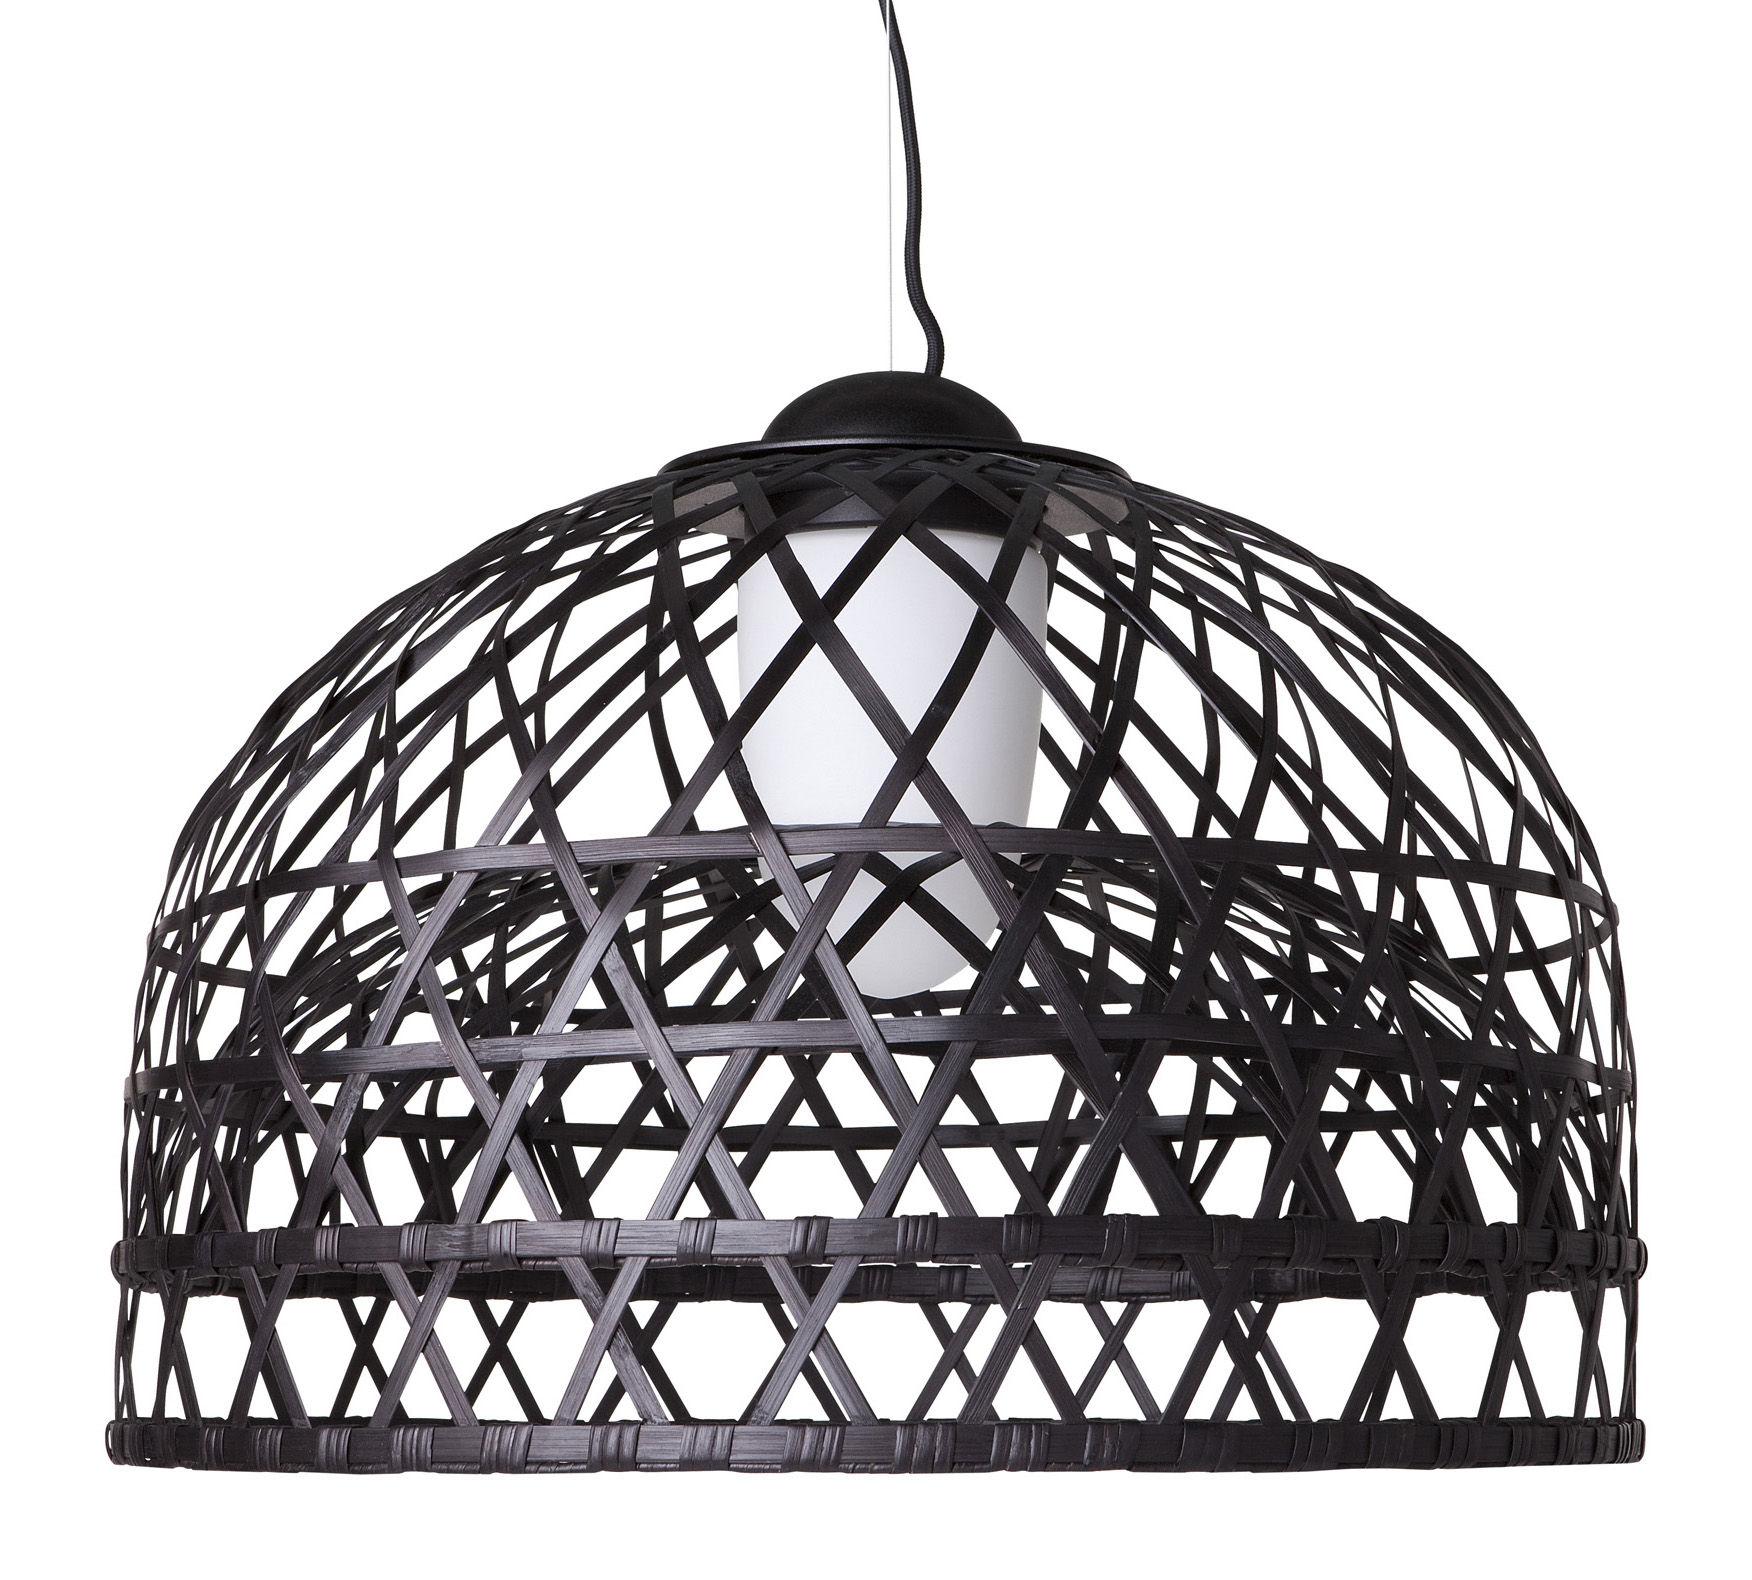 Leuchten - Pendelleuchten - Emperor Pendelleuchte small - Moooi - Ø 60 cm - schwarz - Aluminium, Rattan